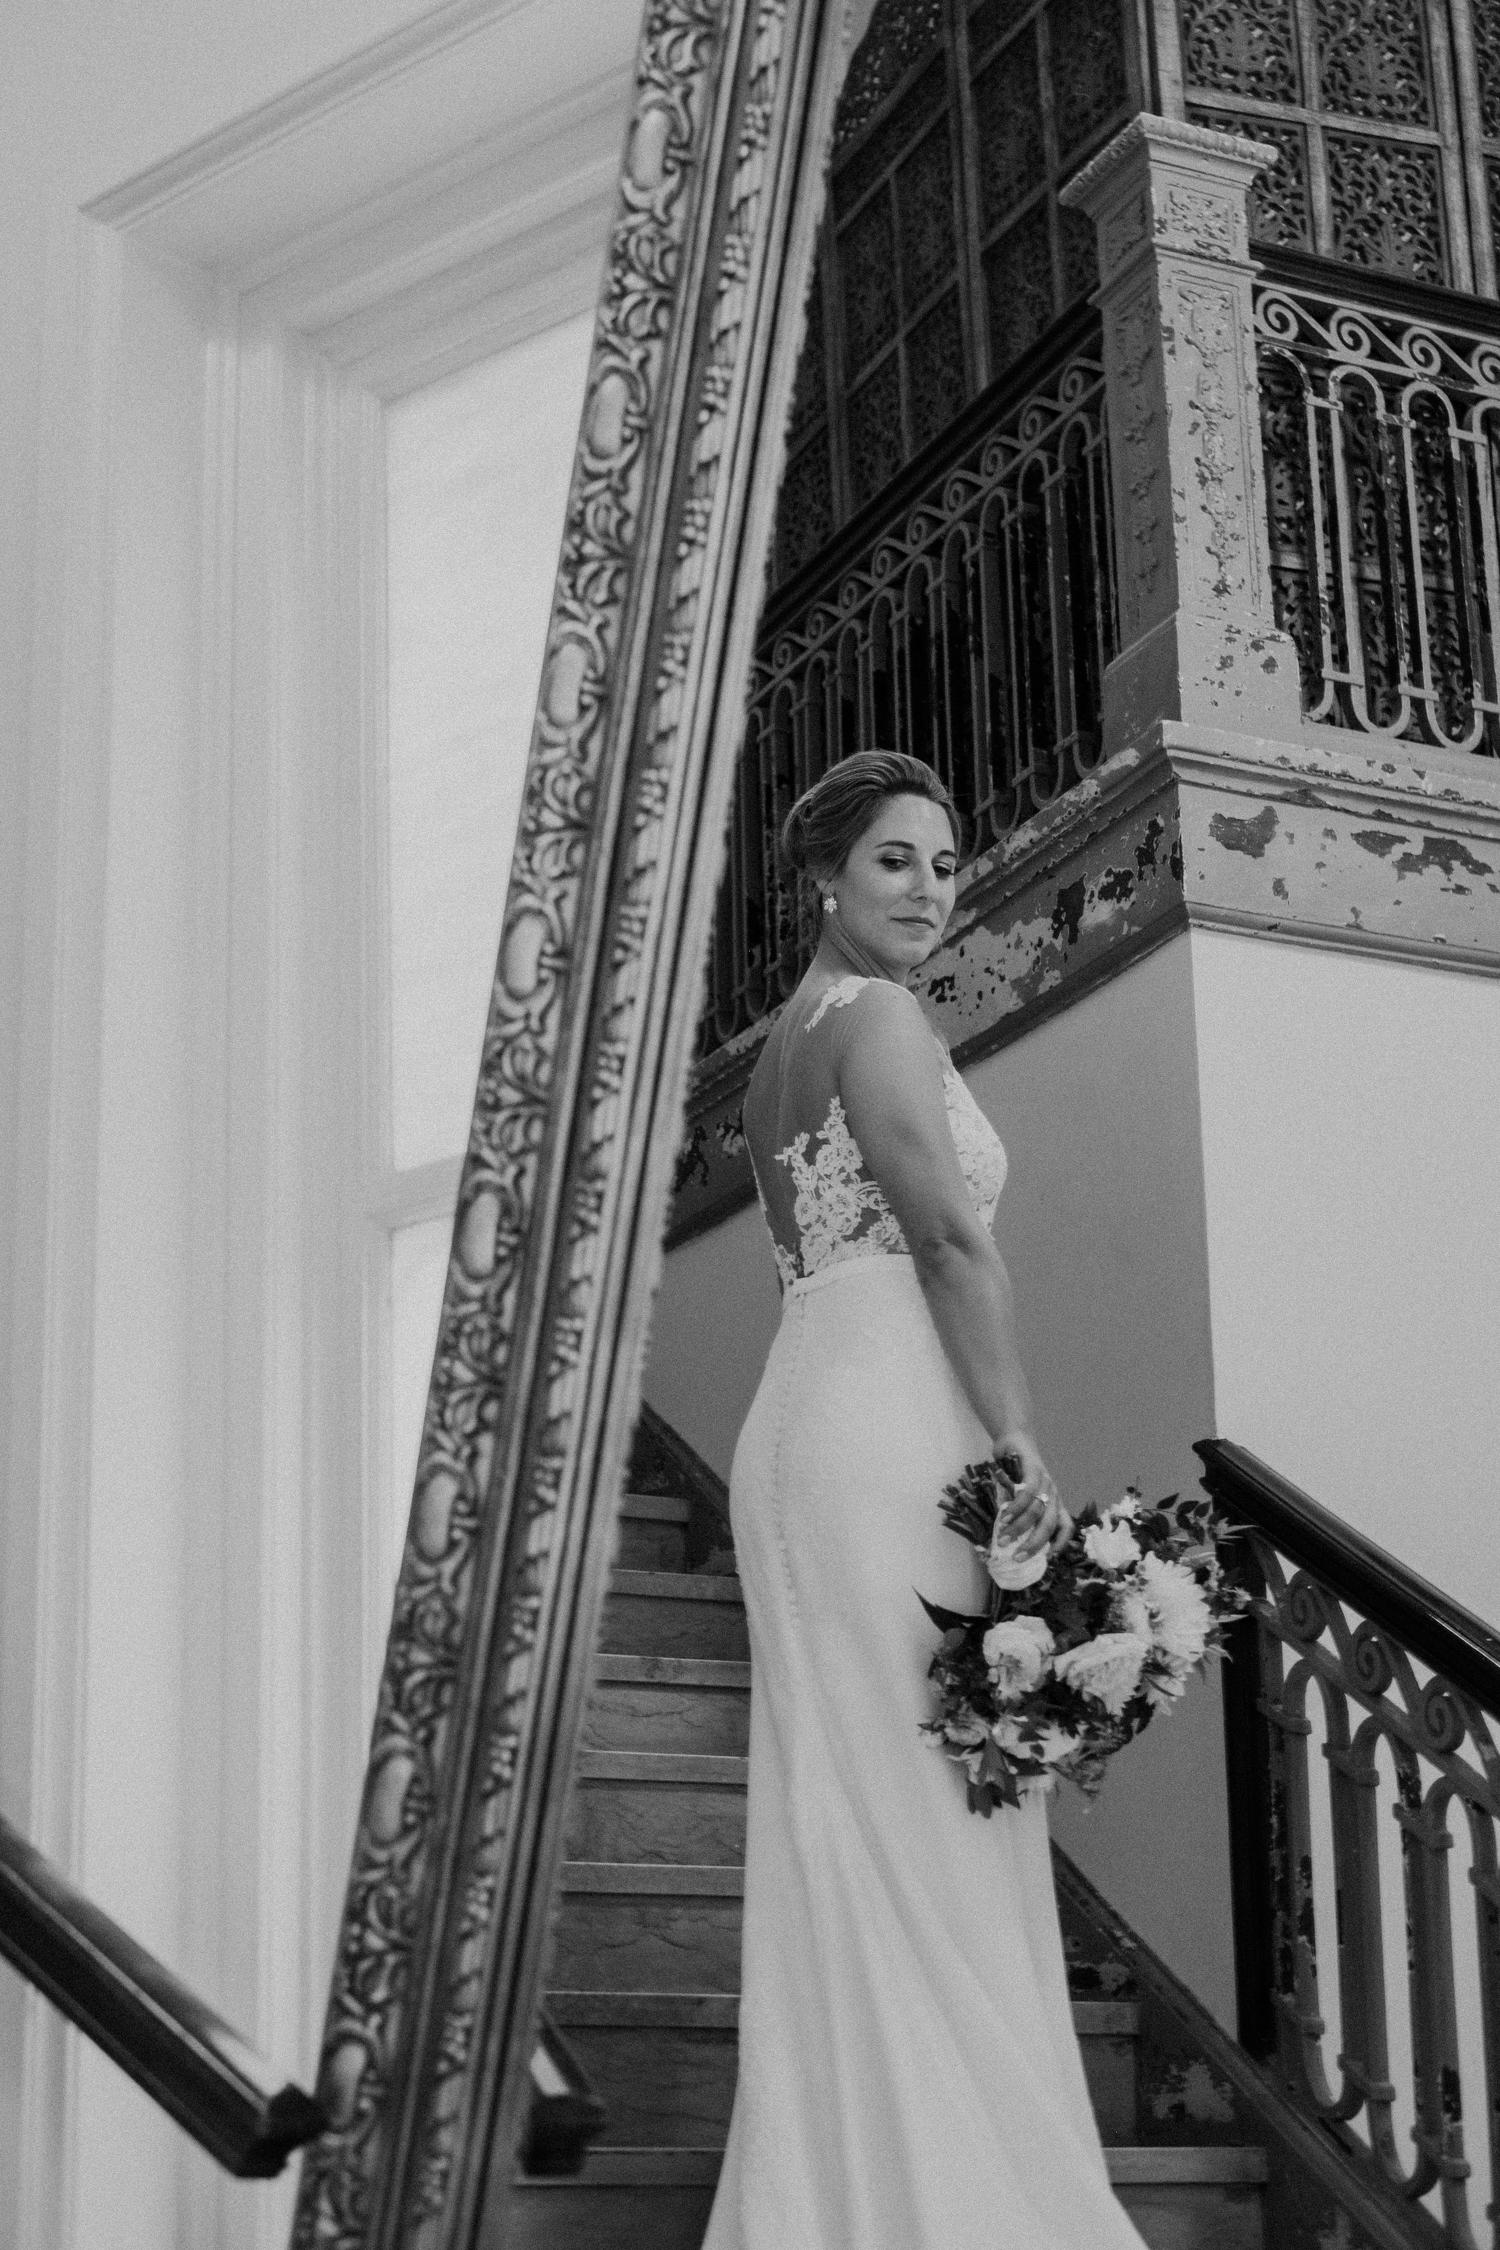 dc-line-hotel-wedding-53.jpg